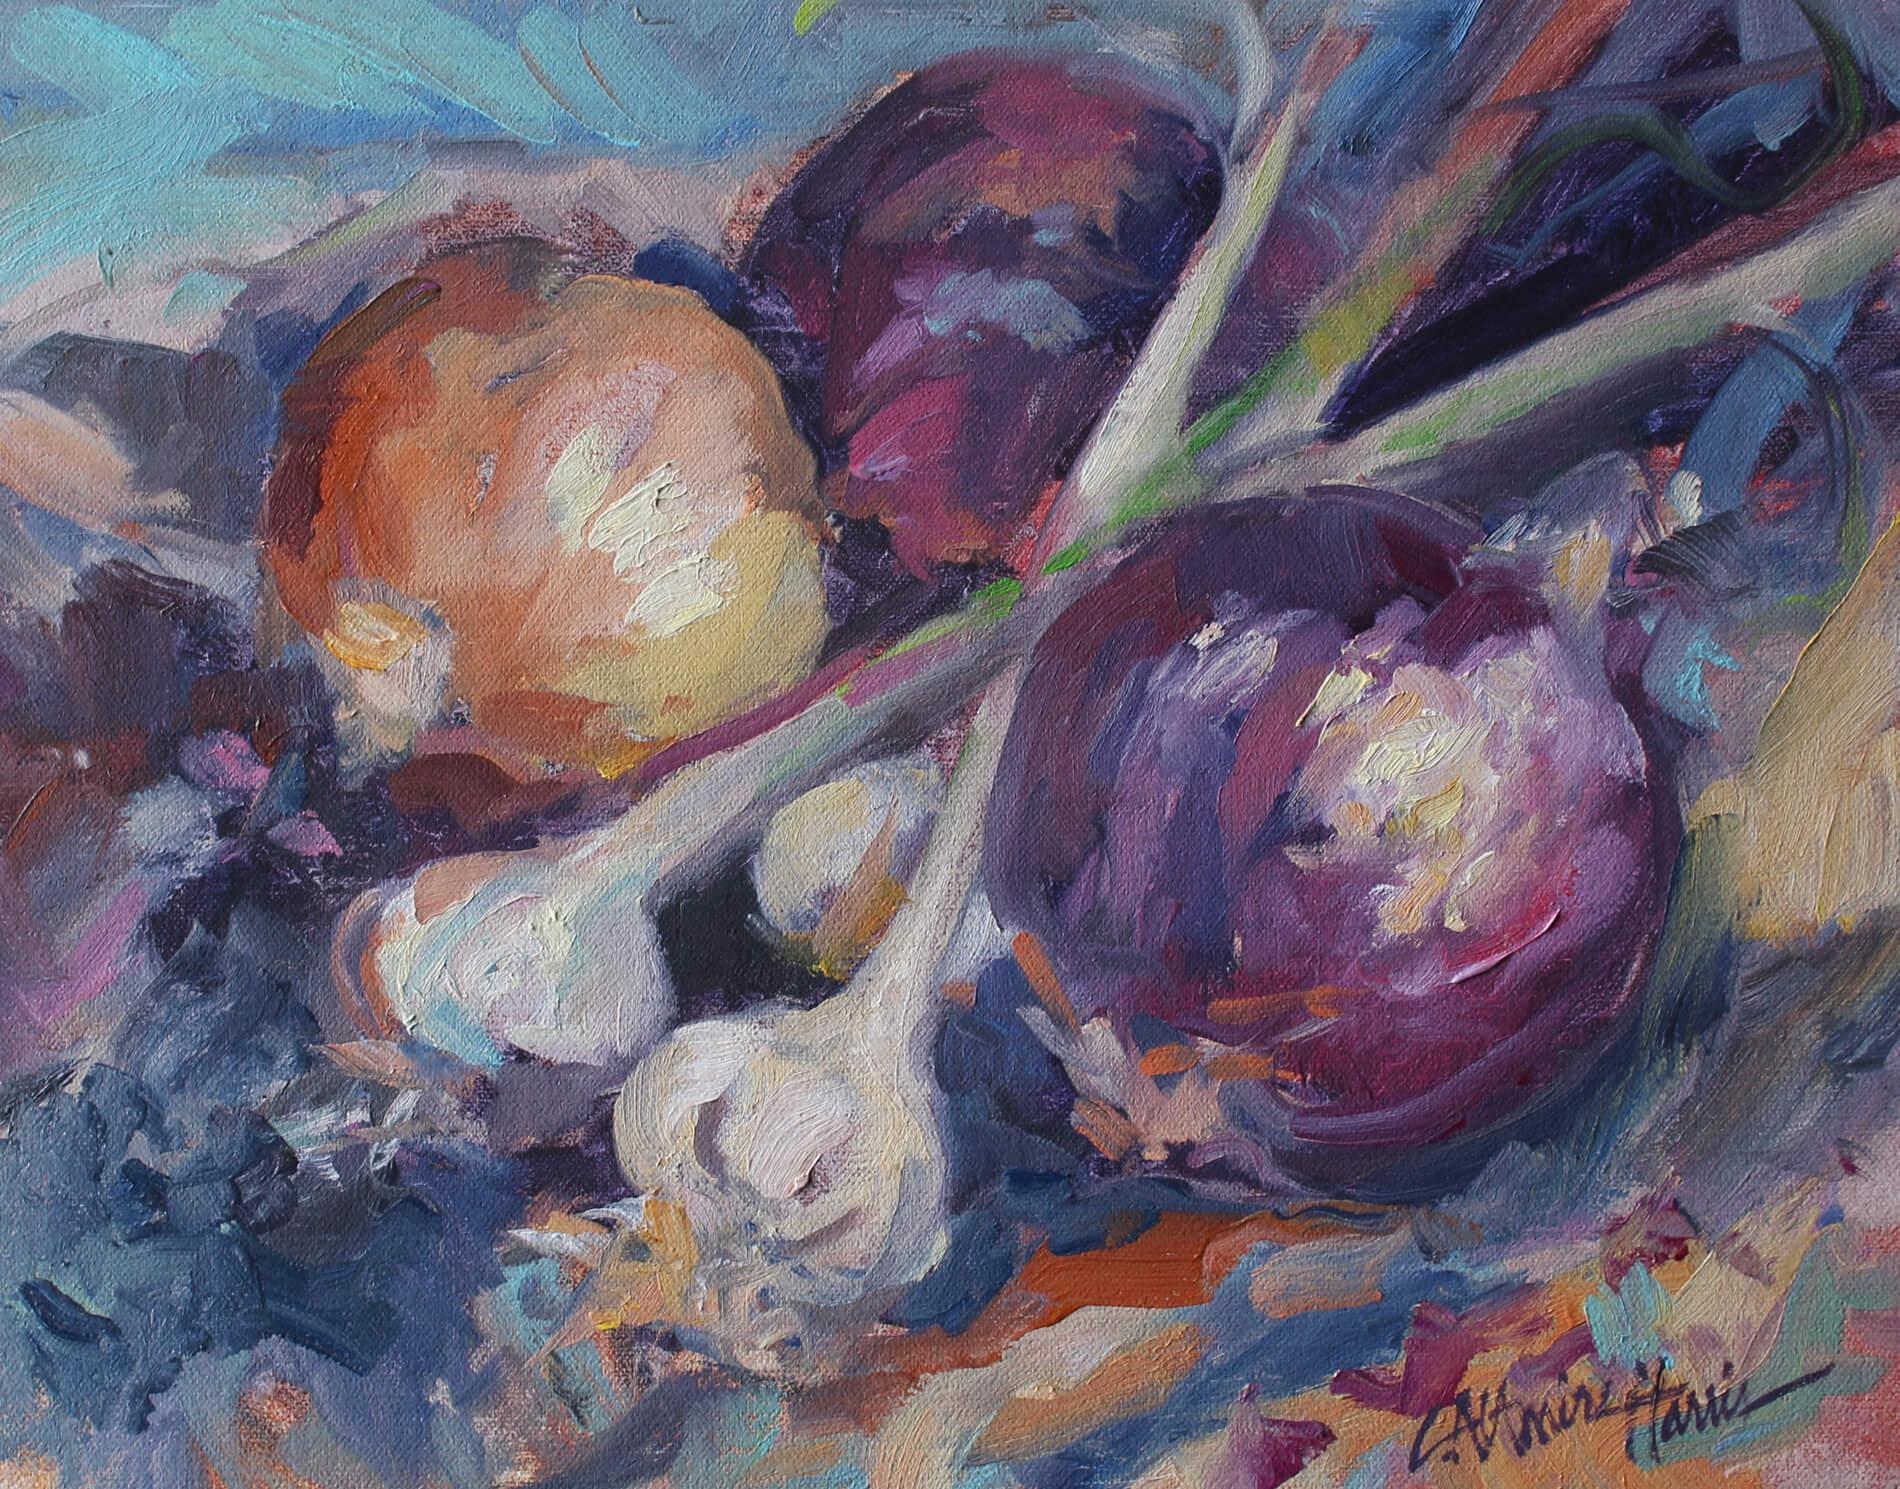 Onion and Garlic*